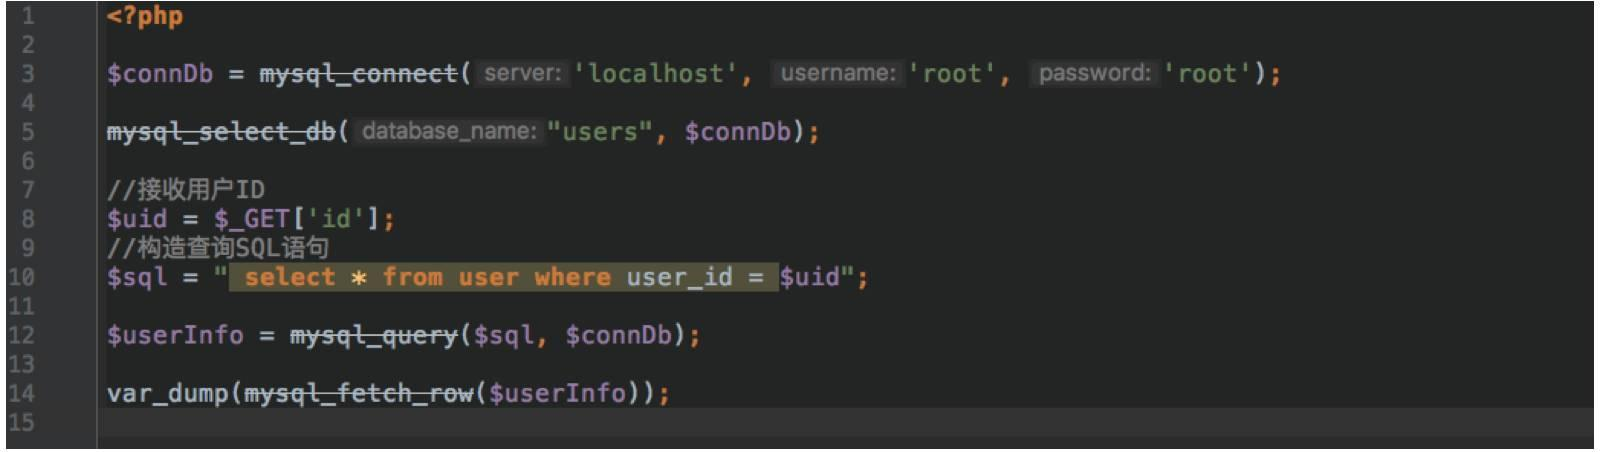 Web 安全 PHP 代码审查之常规漏洞